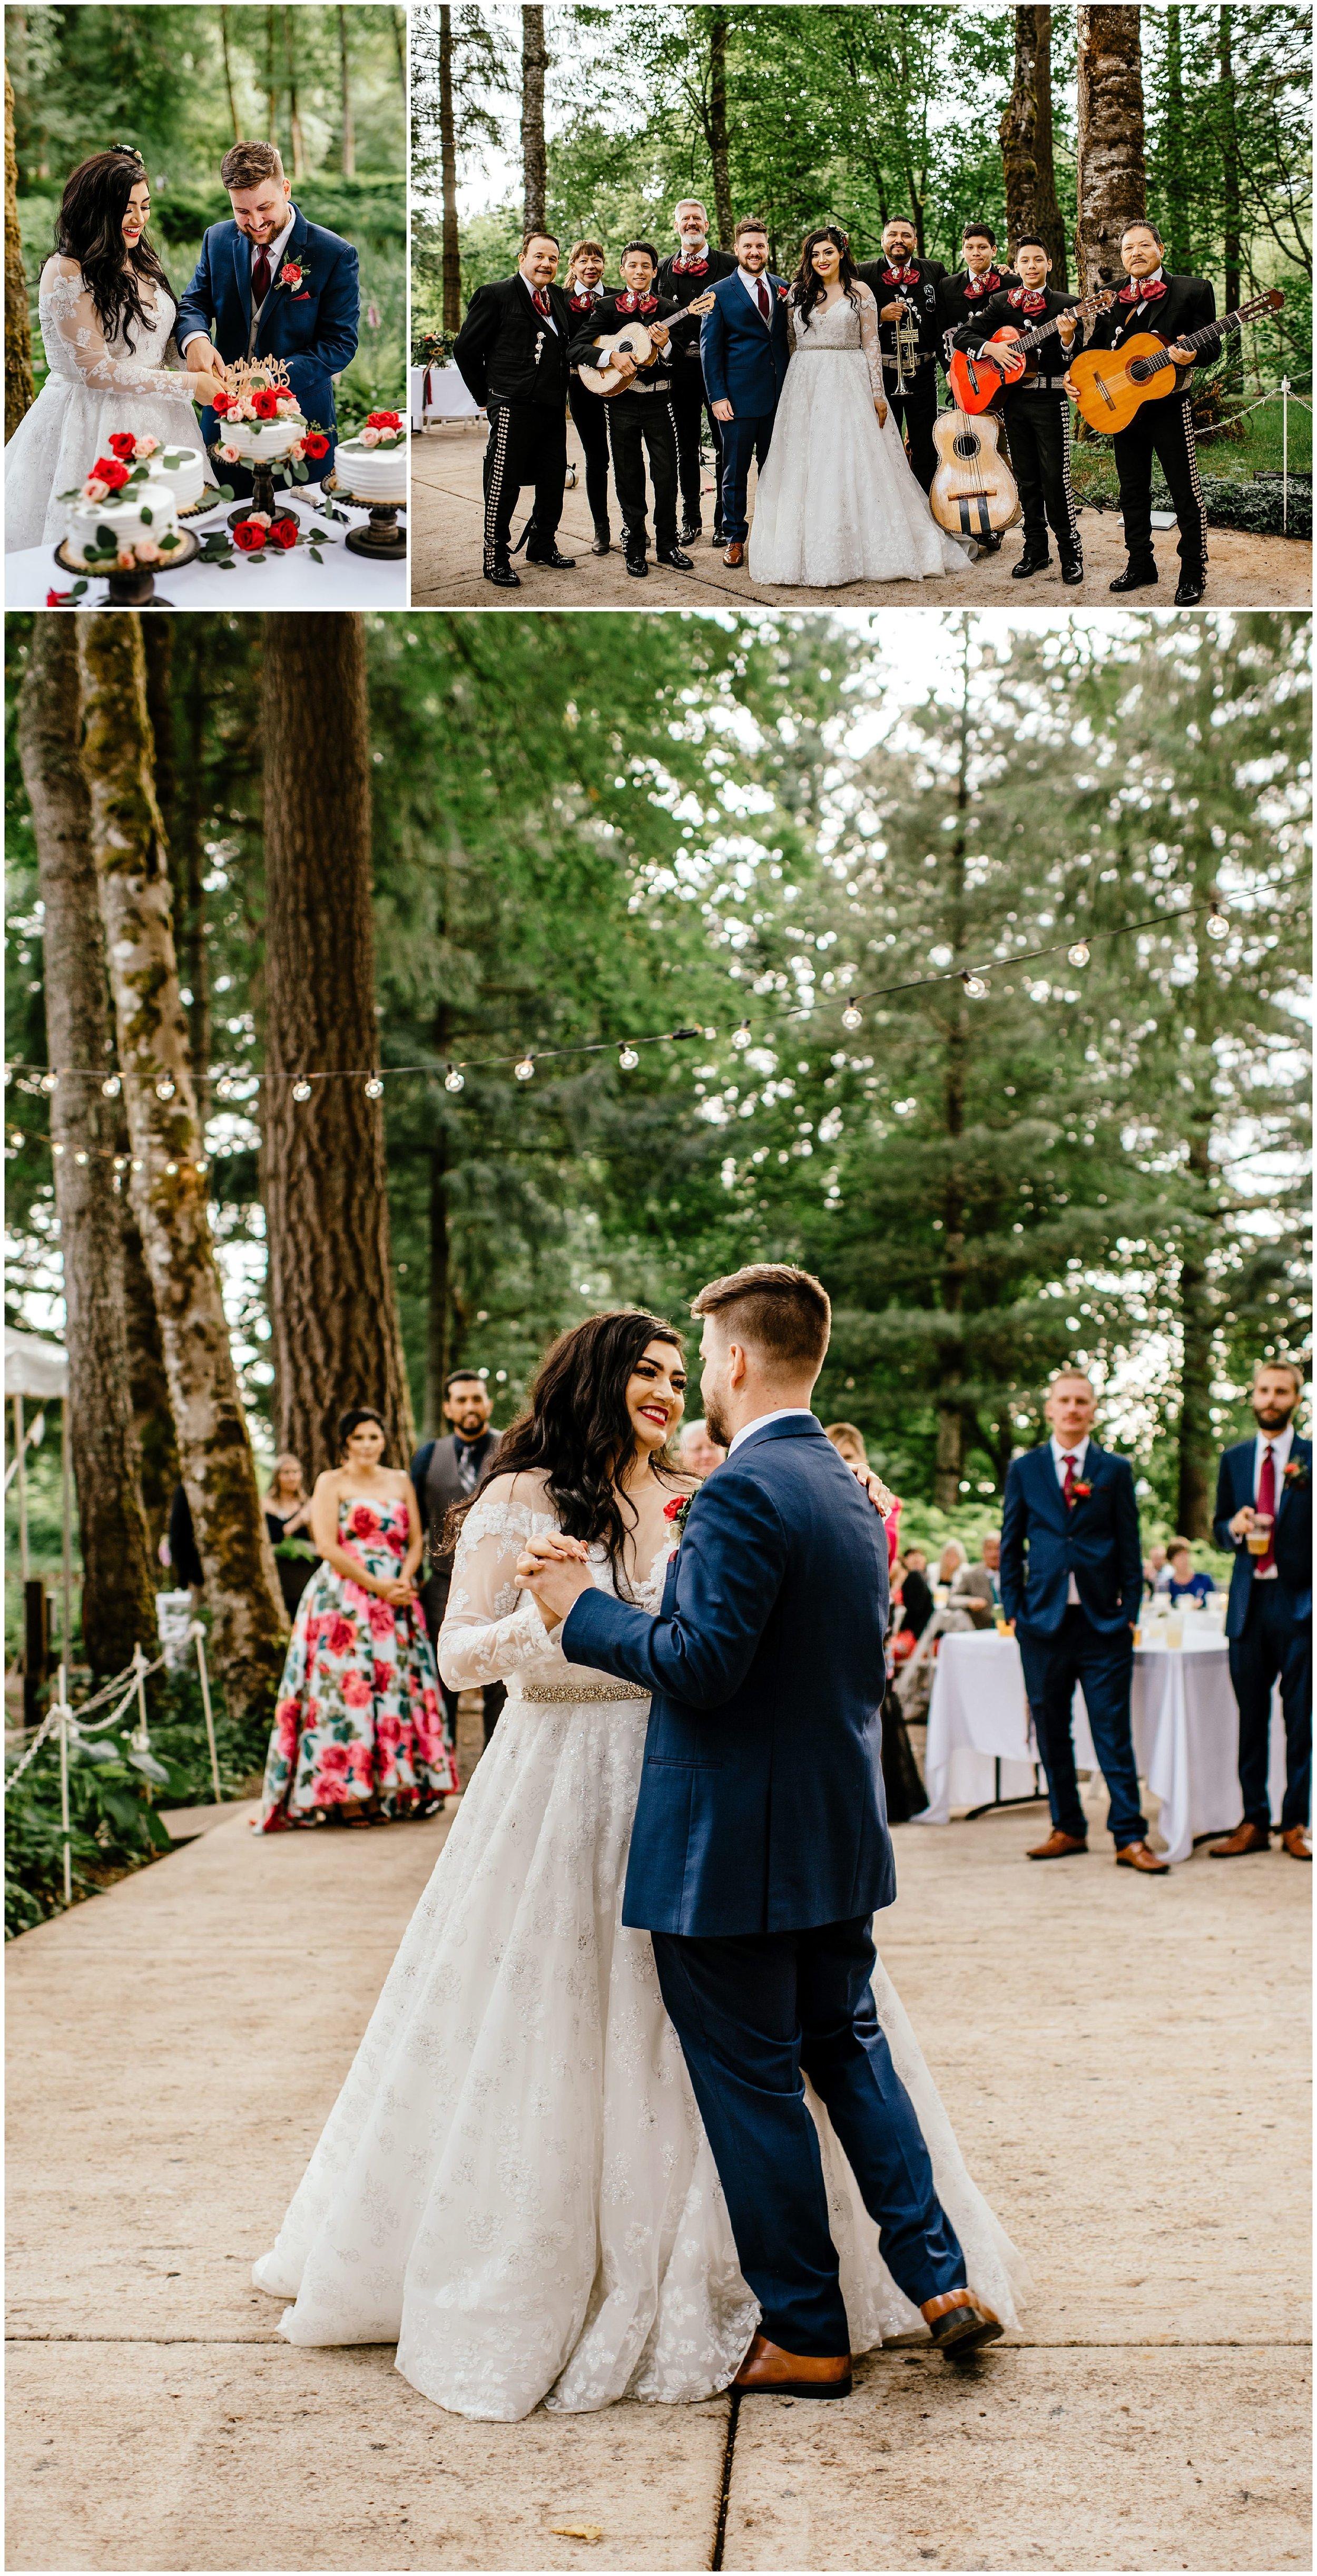 Spanish-inspired-wedding-At-bridal-veil-lakes-88.jpg